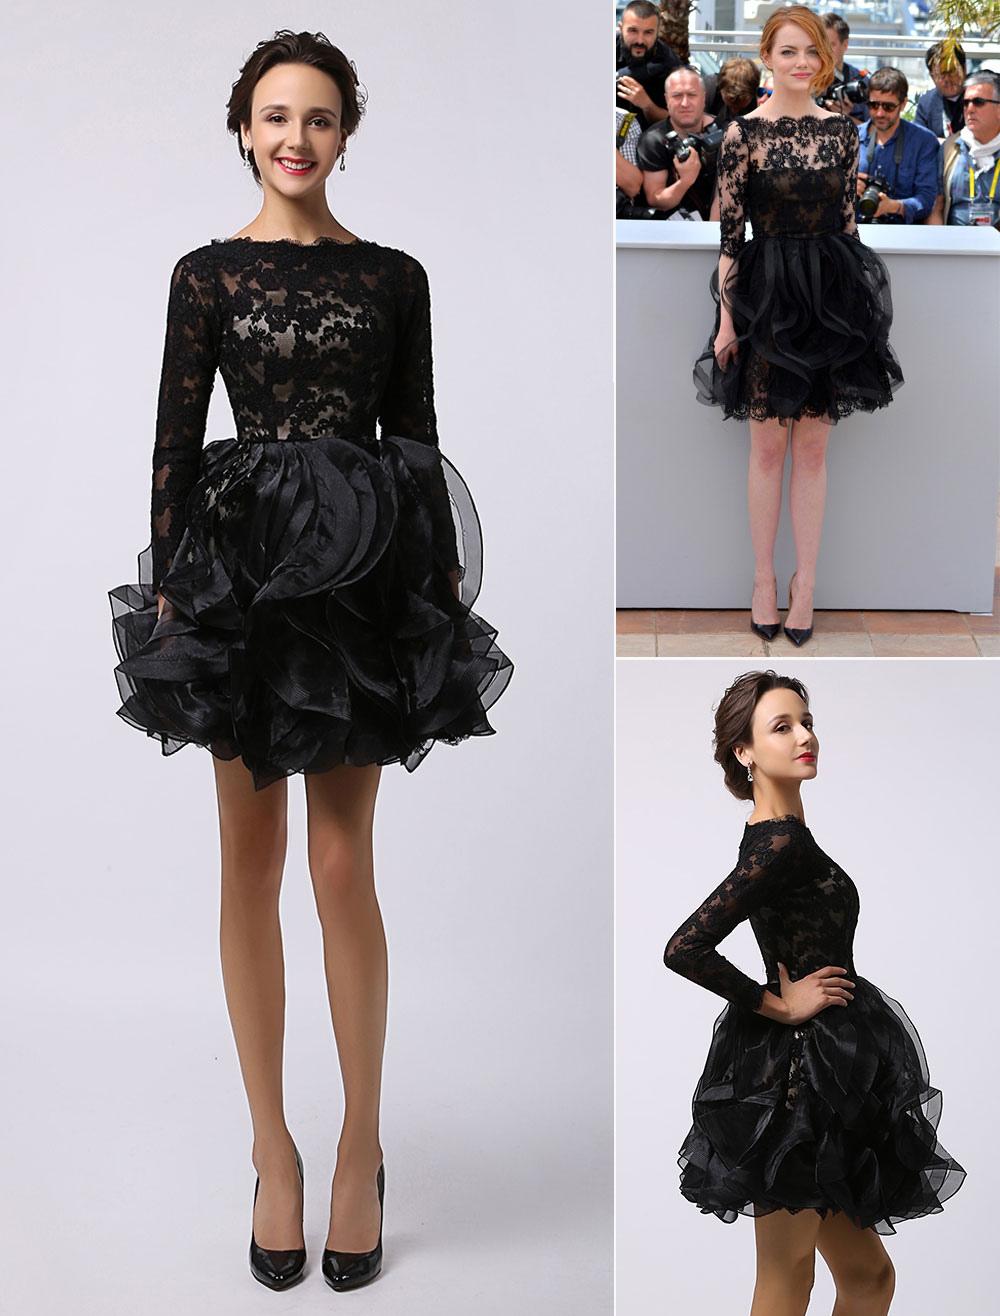 Emma Stone Cannes Black Long Sleeves Sheer Lace Organza Dress (Wedding) photo